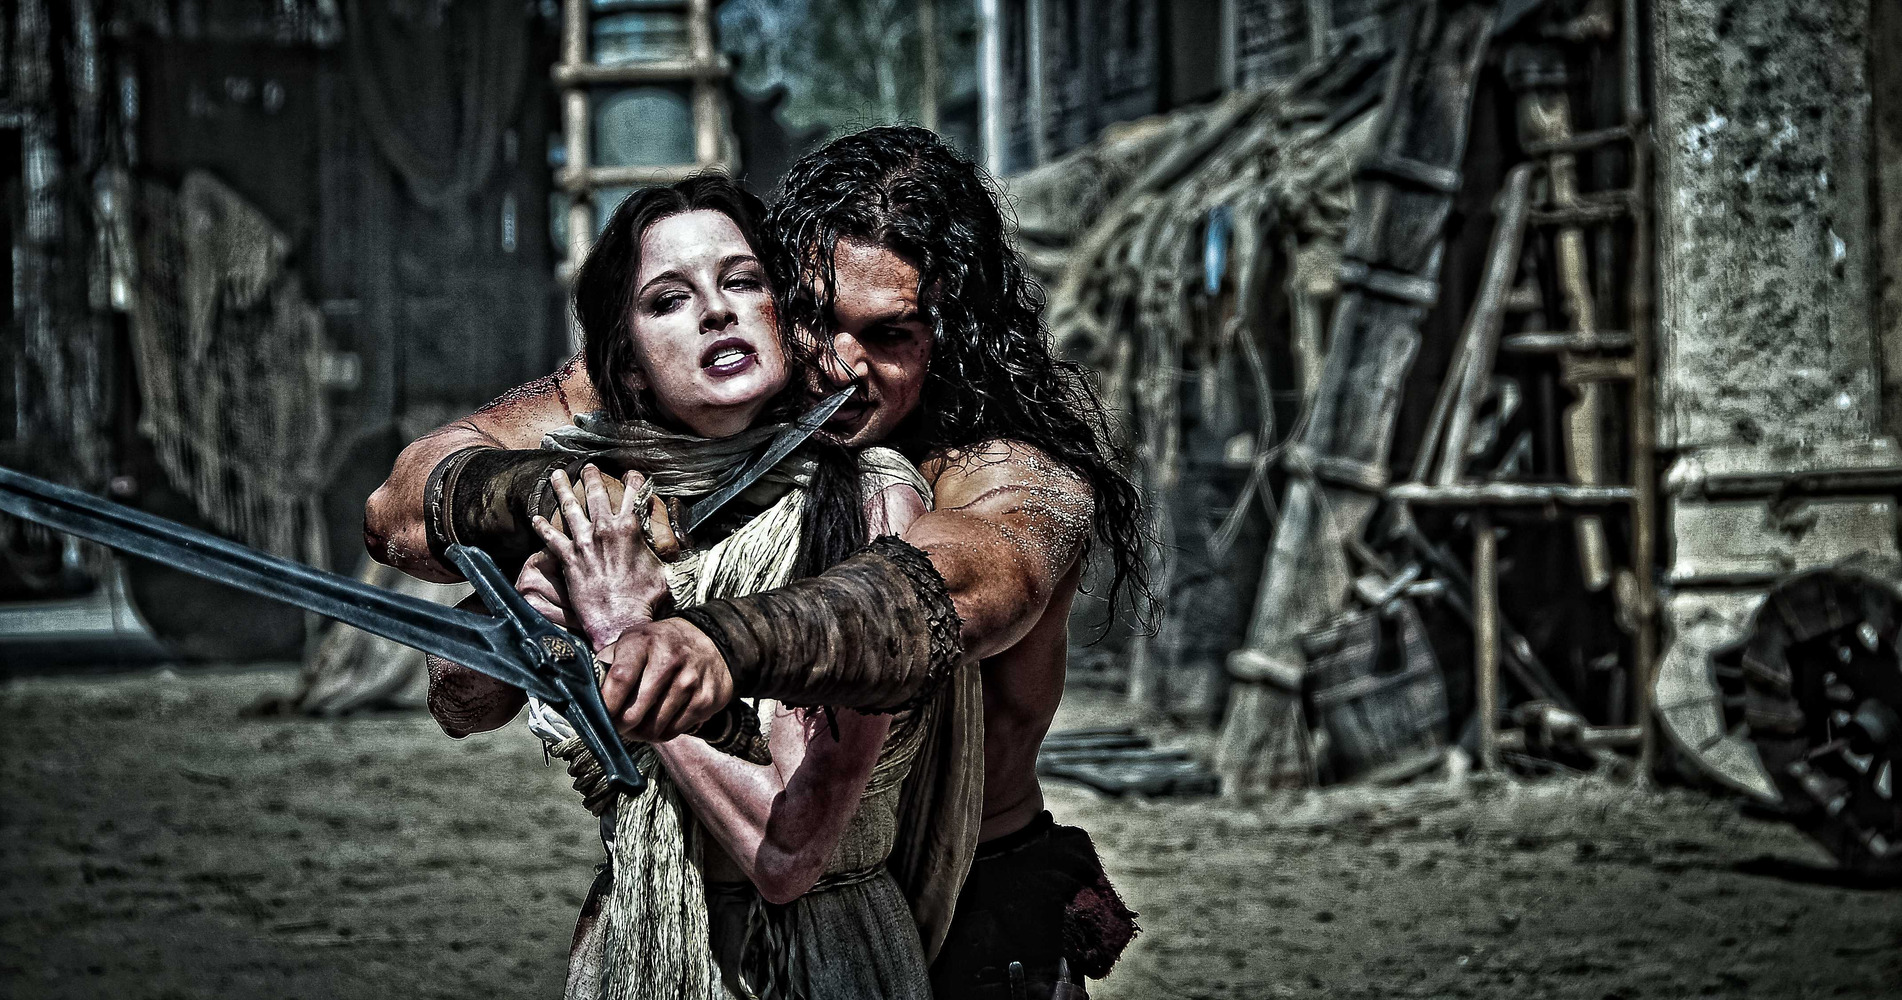 Conan 2011 Delightful critique : conan, un film de marcus nispel - critikat